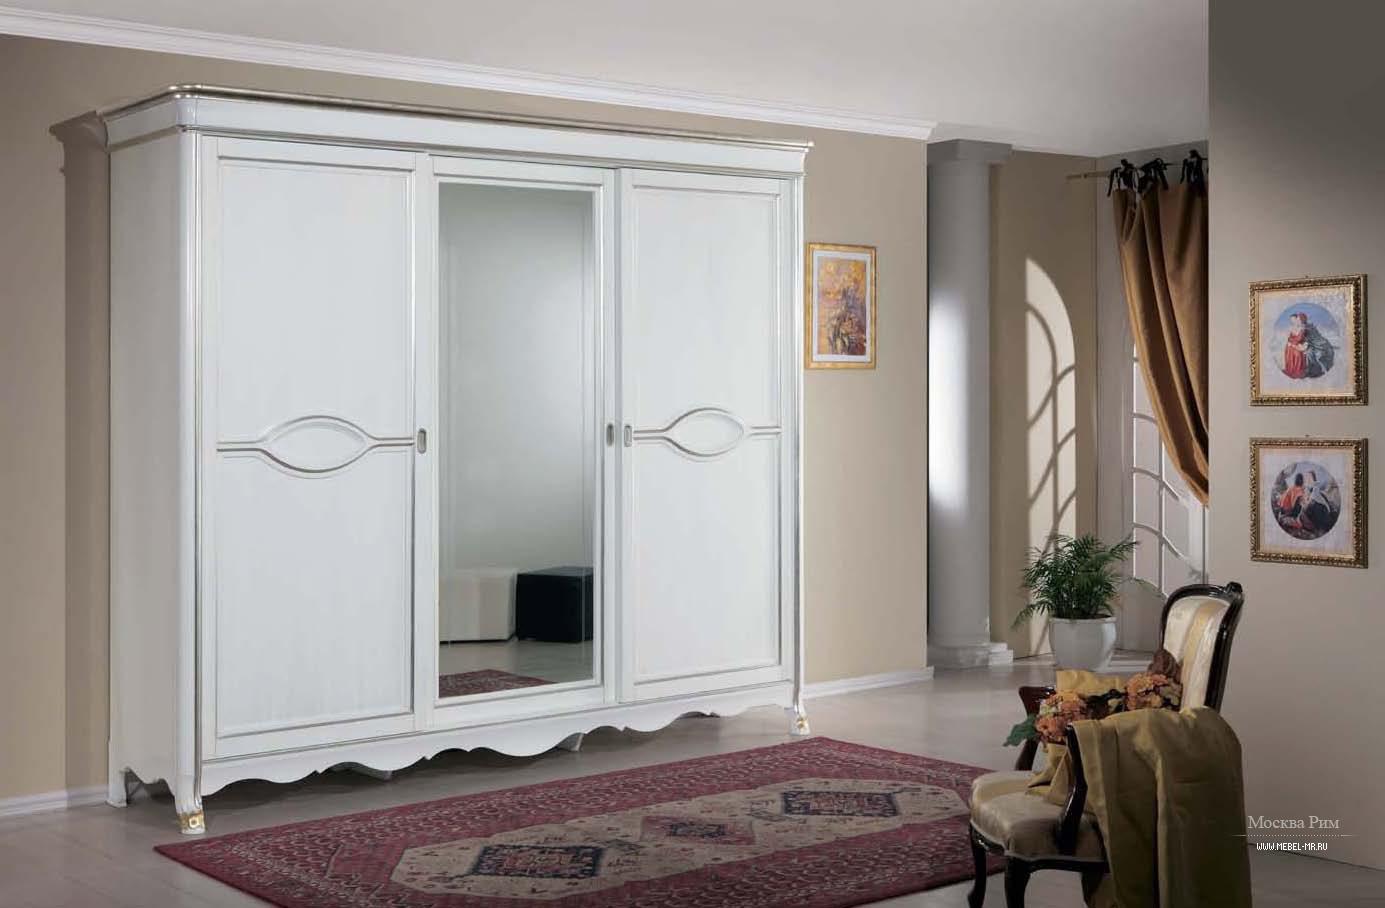 5131659 шкаф-купе 3-х дверный с зеркалом arena tarocco vacca.